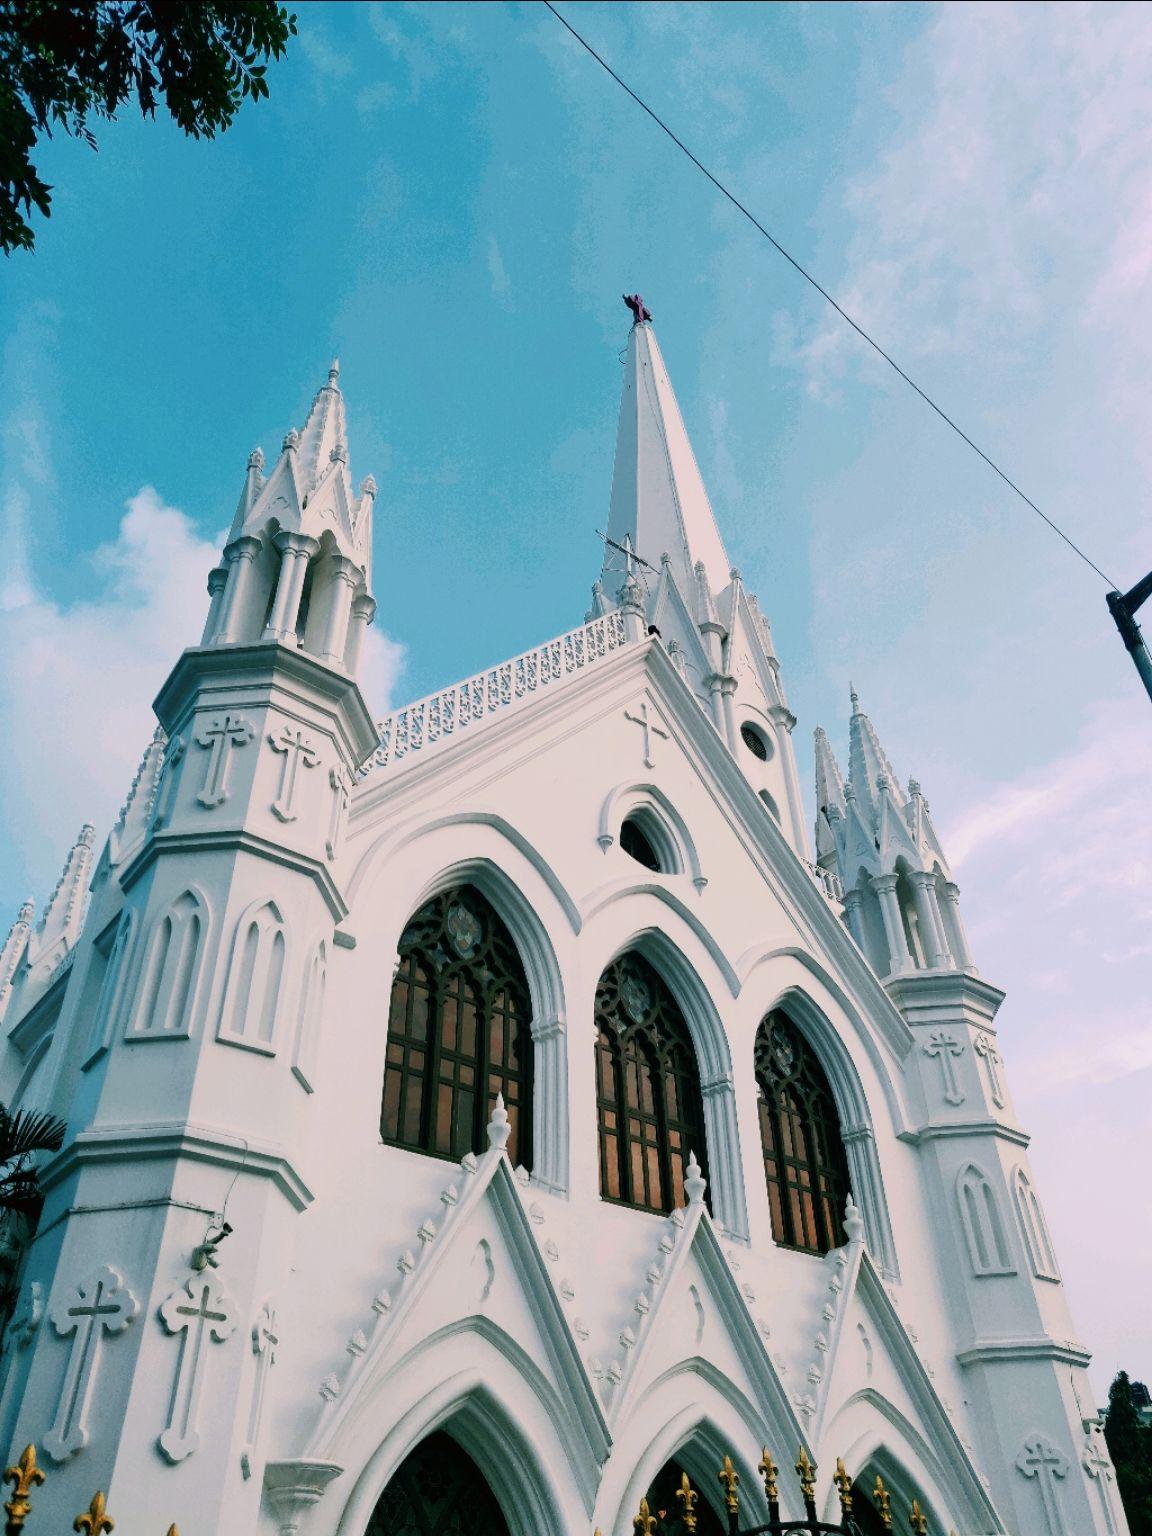 Photo of Santhome Cathedral Basilica By Saket Lakhotia